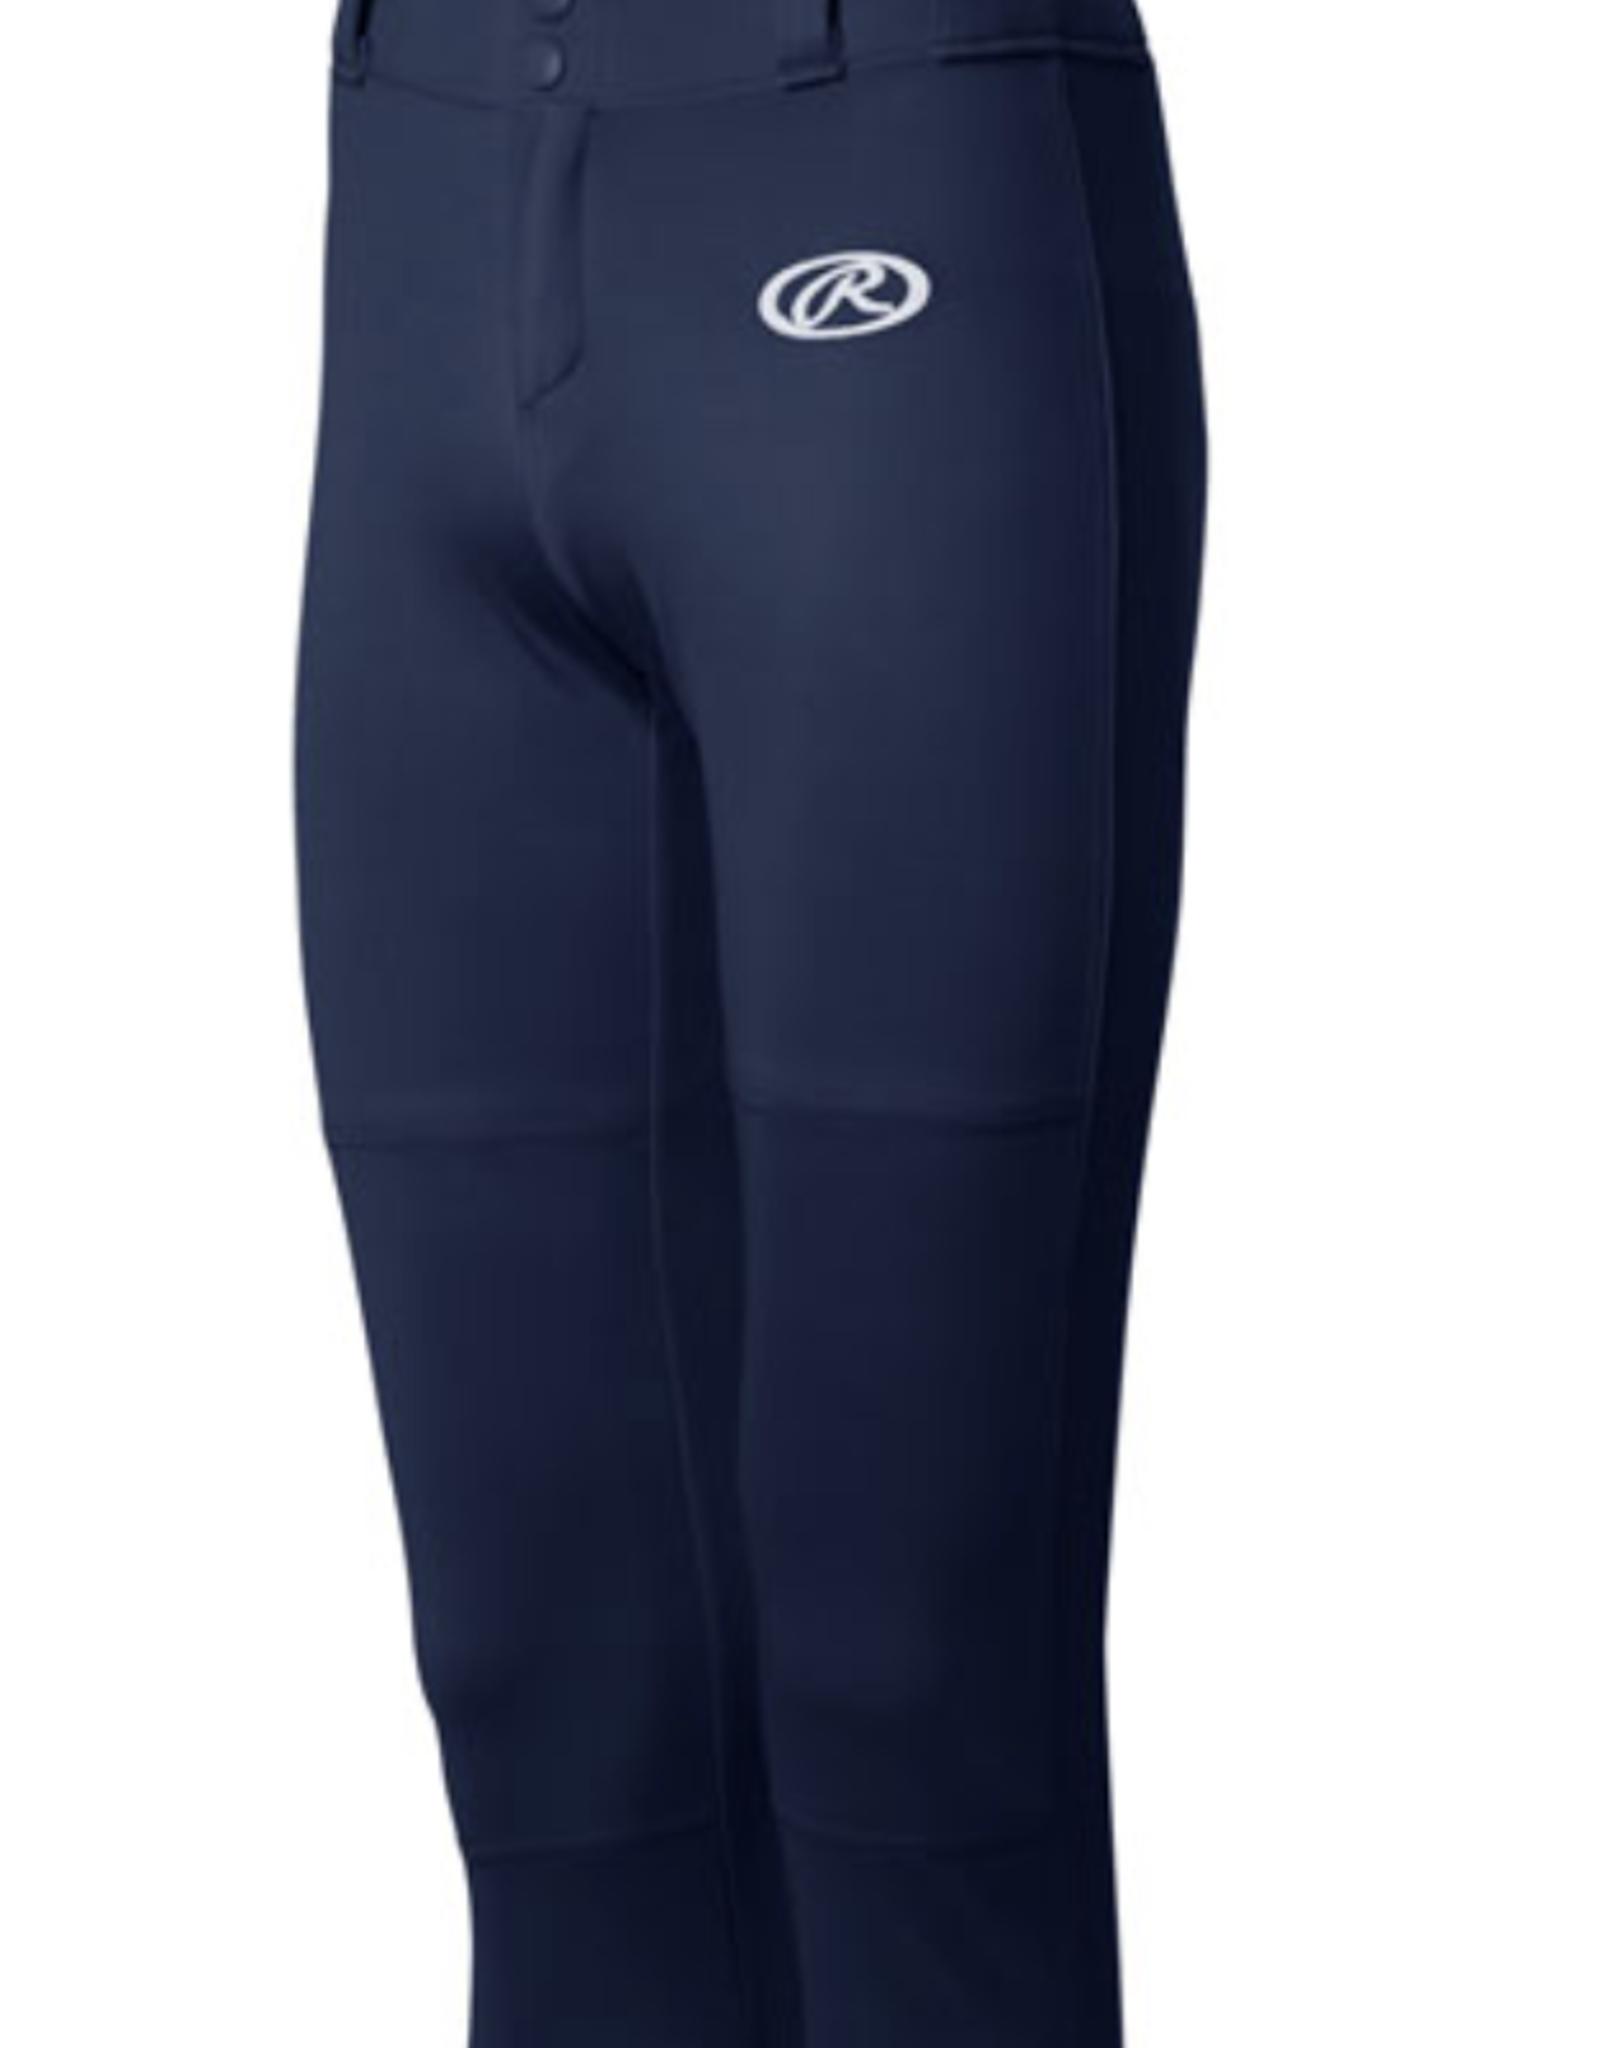 Rawlings Rawlings Launch Pant girls